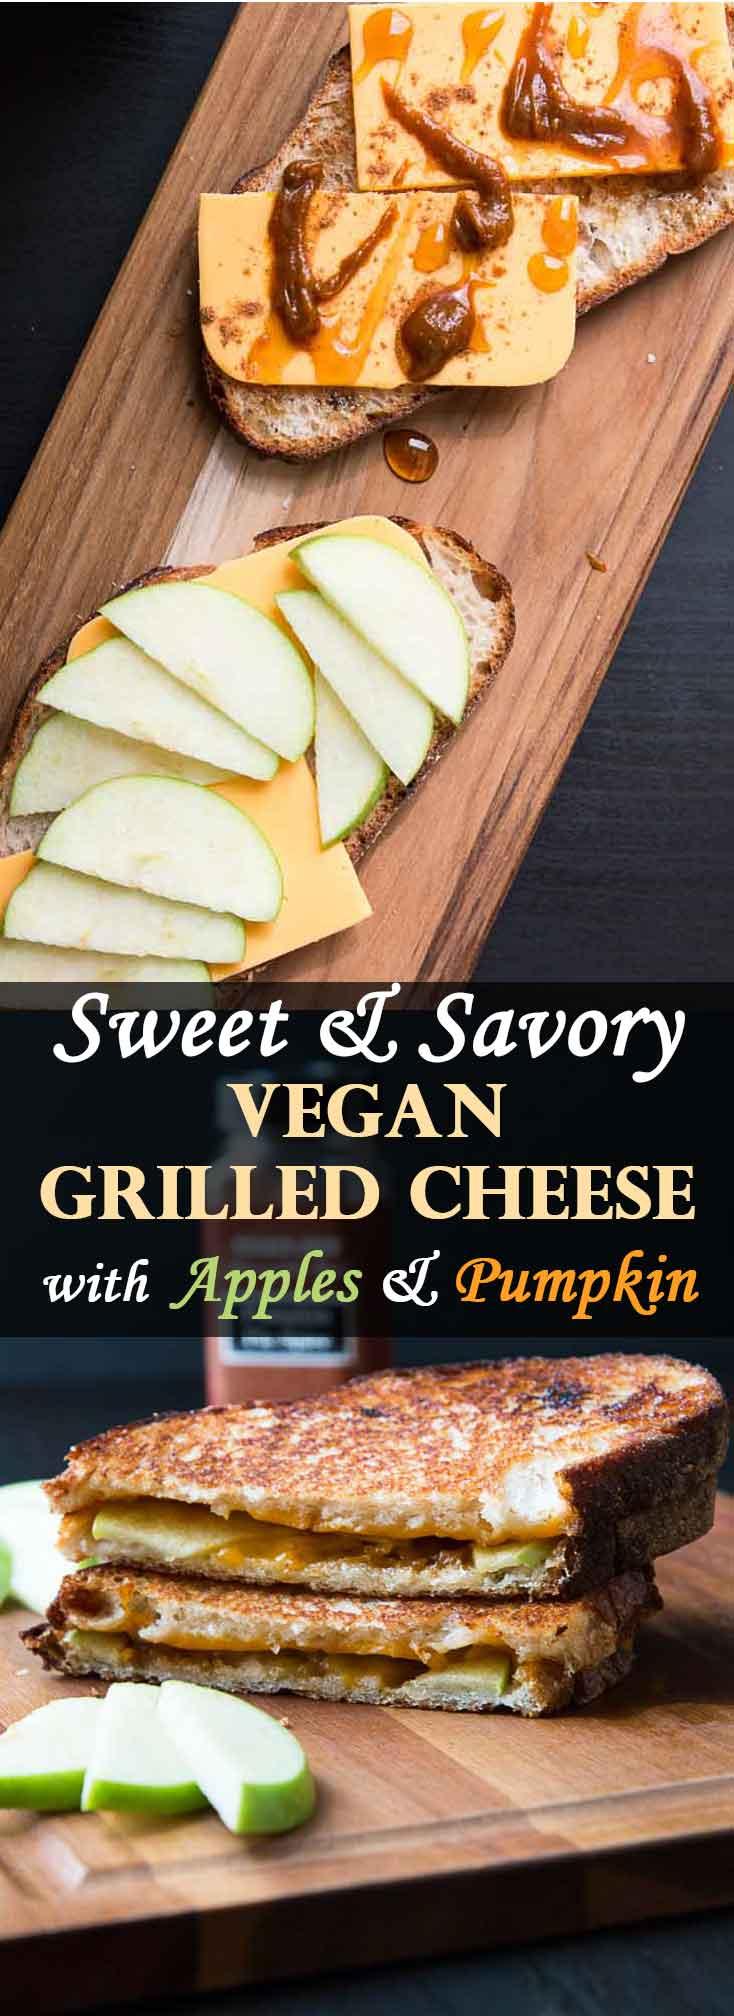 Sweet & Savory Vegan Grilled Cheese with Apples and Pumpkin #vegan | Vegetarian Gastronomy | www.VegetarianGastronomy